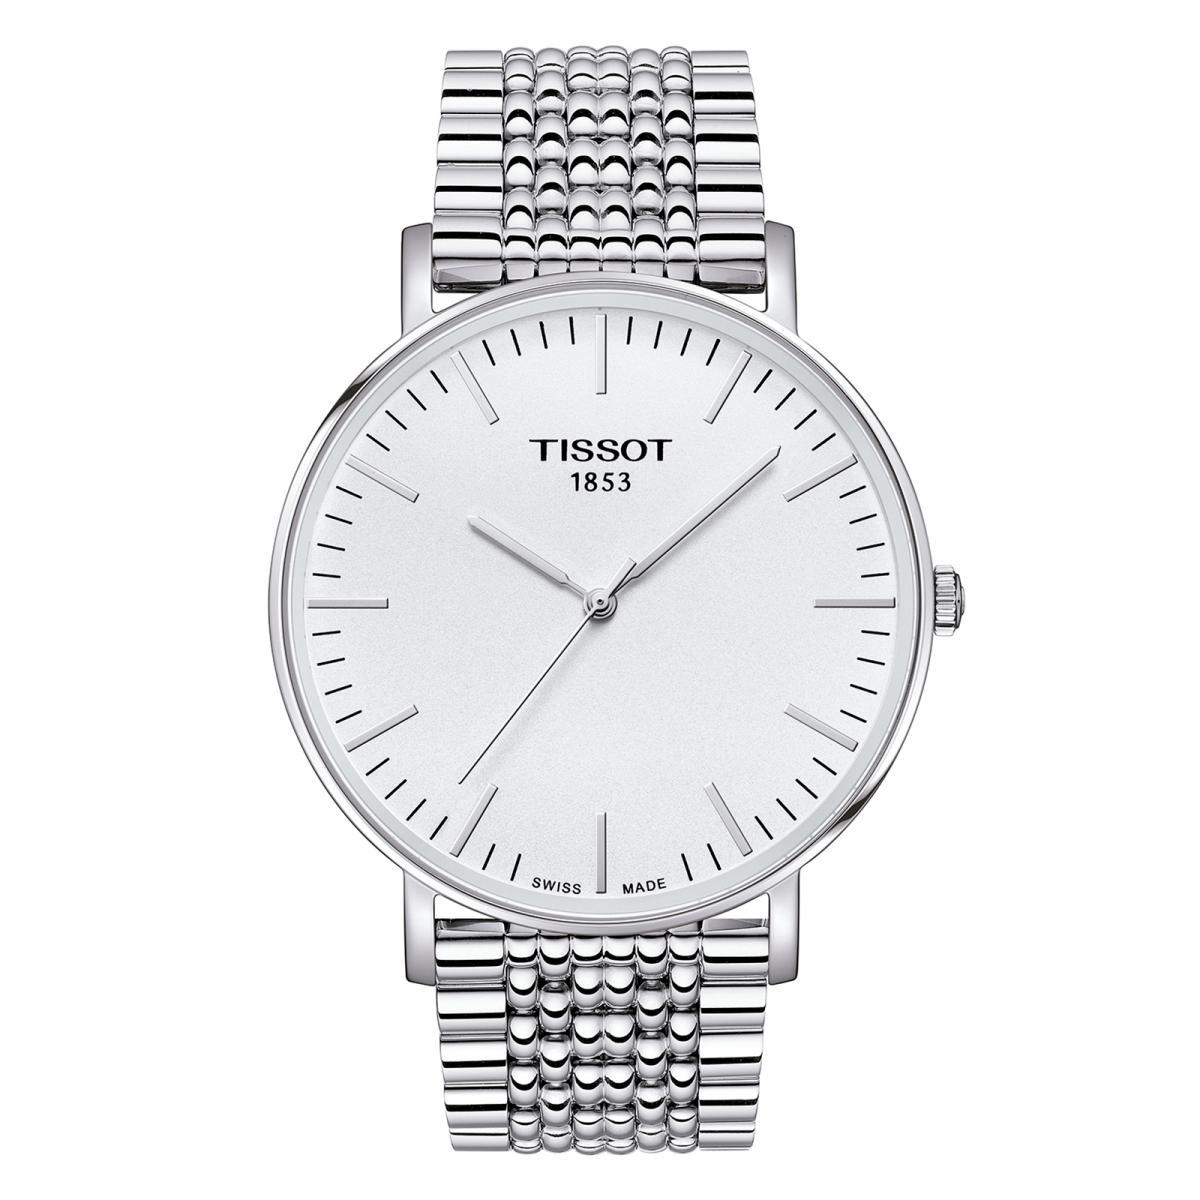 16816a516770 Reloj Tissot - T109.610.11.031.00 - HOMBRE - Time Square